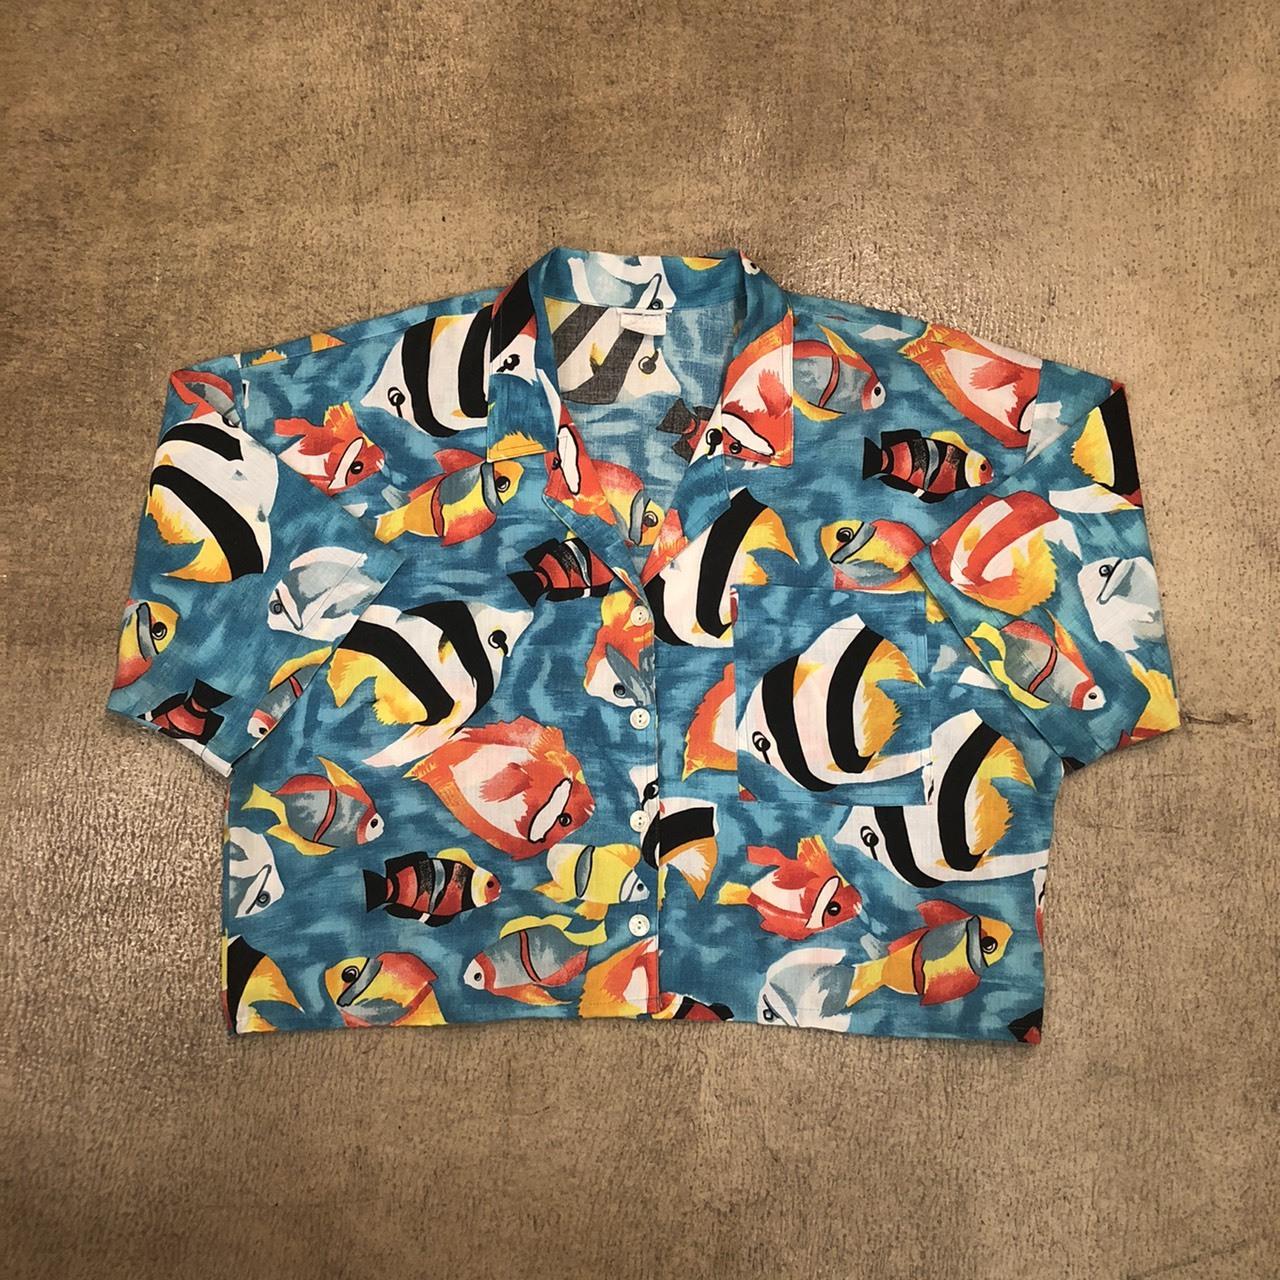 Remake Fish Print Aloha Shirts ¥5,900+tax